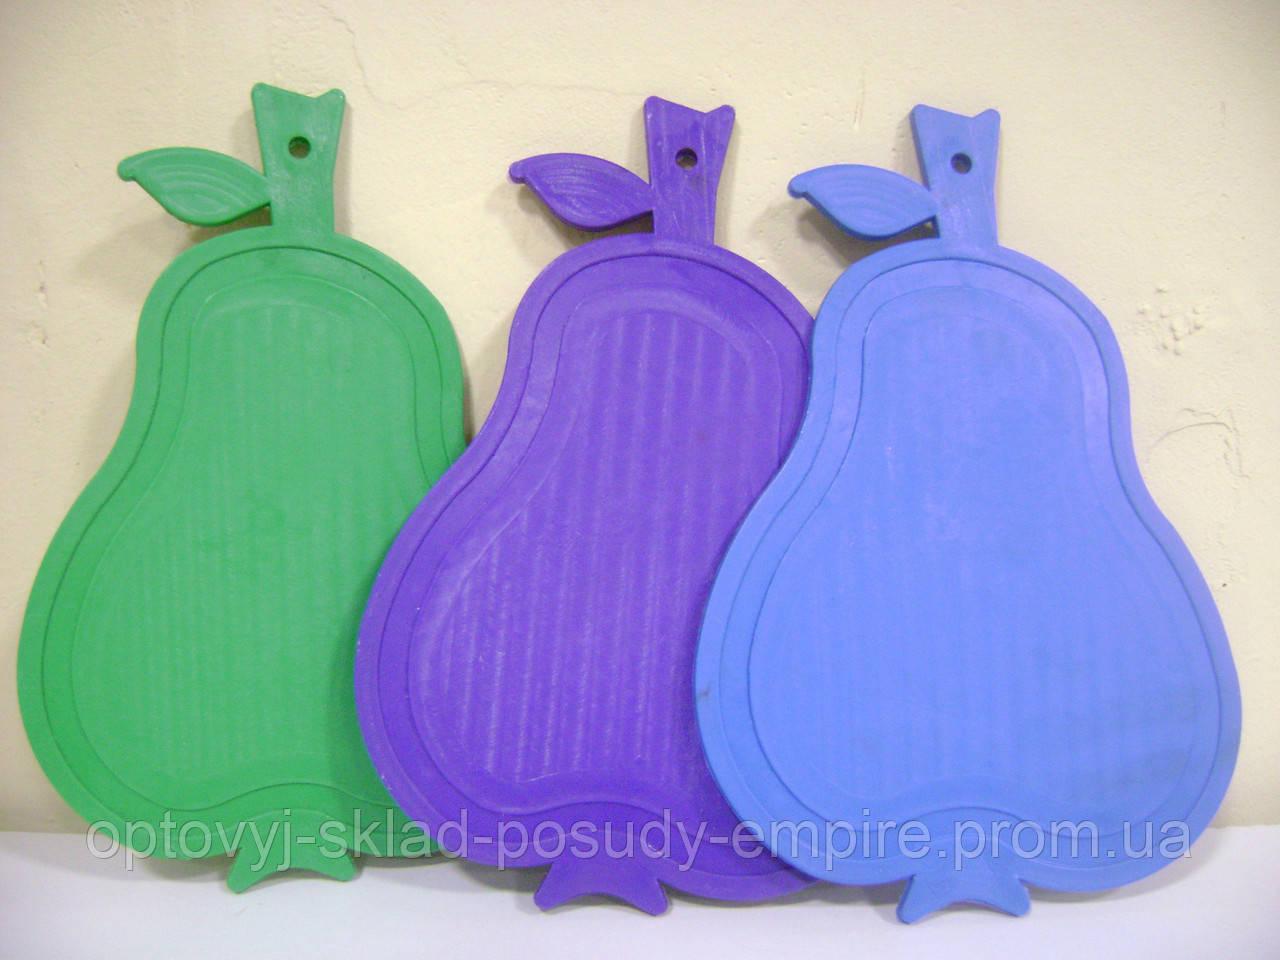 Разделочная доска пластиковая Груша